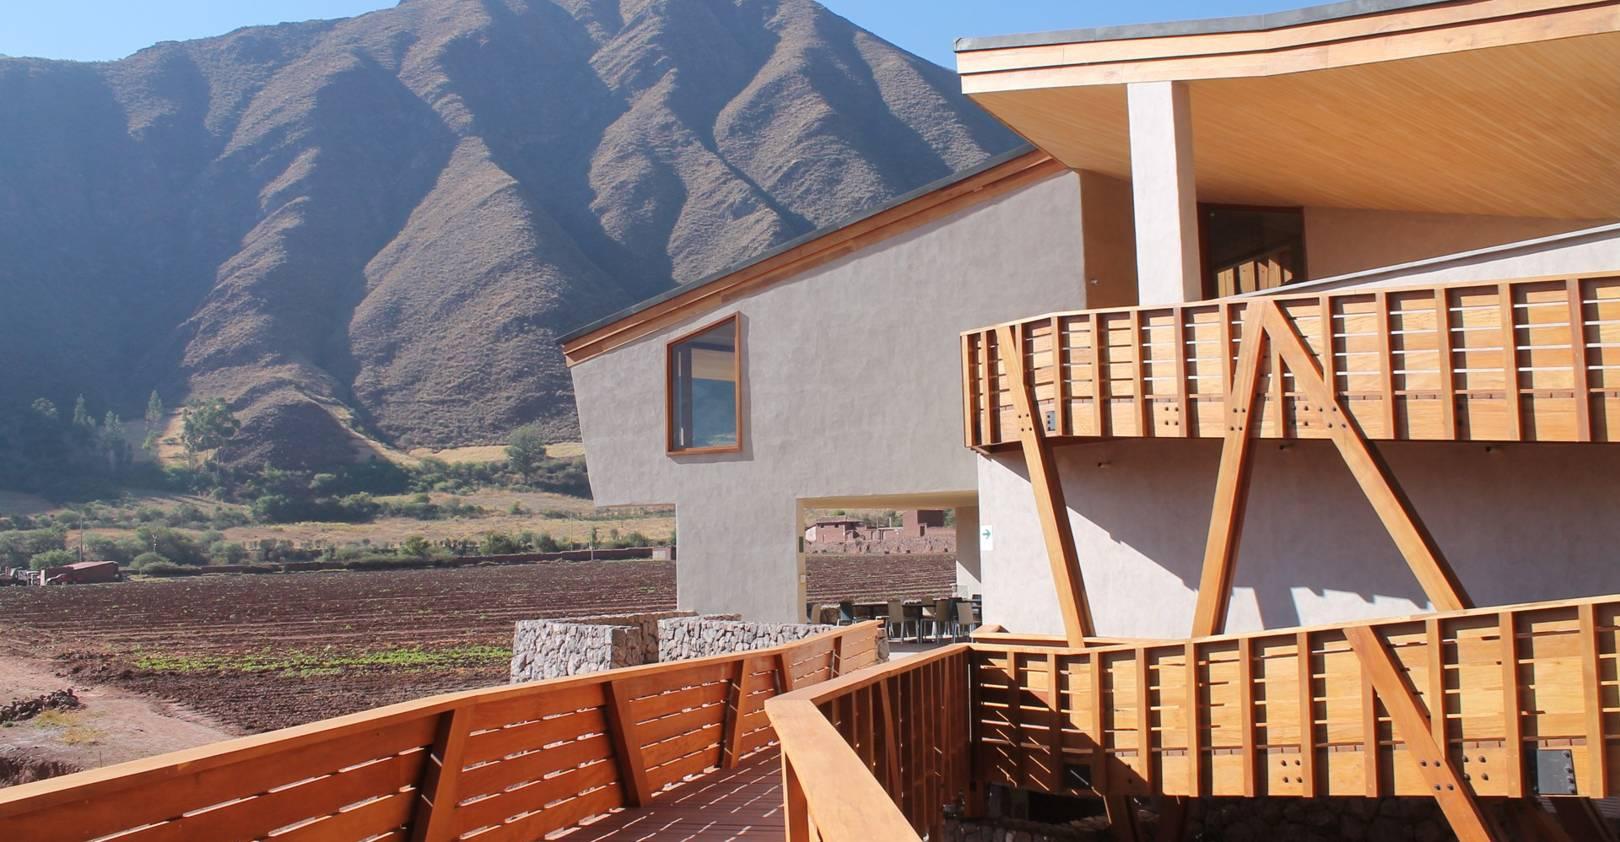 Explora Valle Sagrado – Peru's hot new hotel